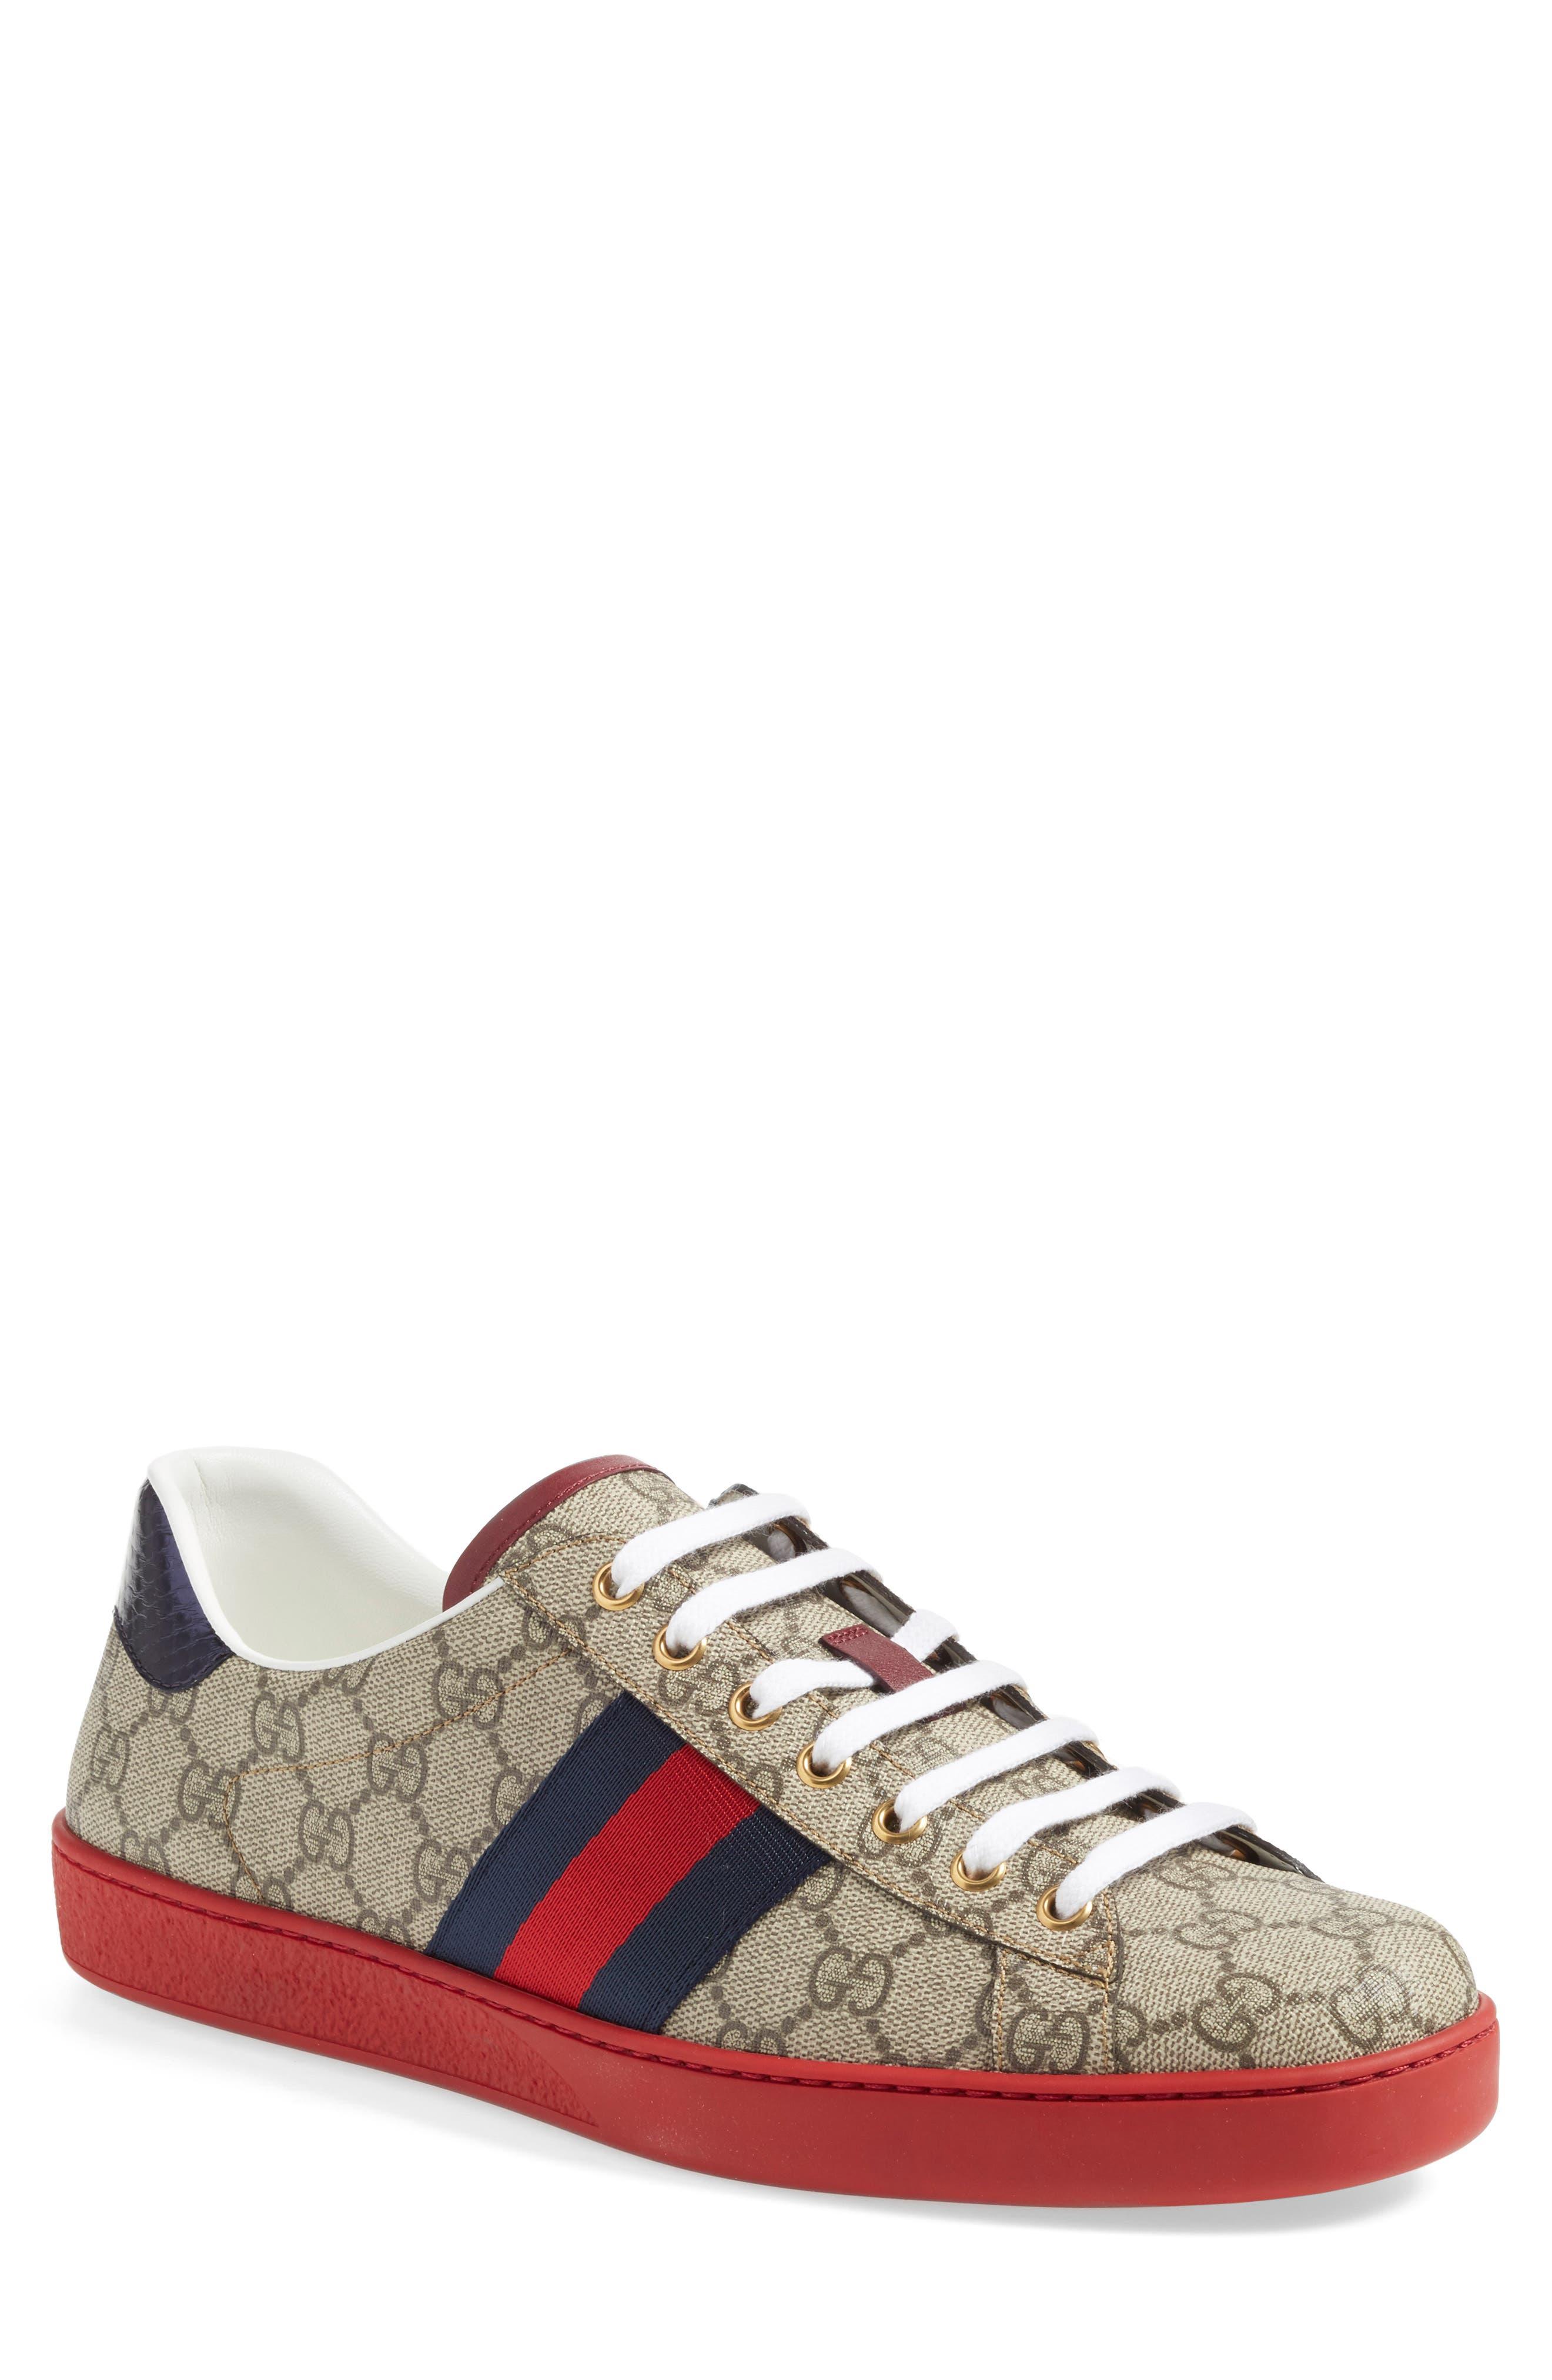 gucci shoes for men